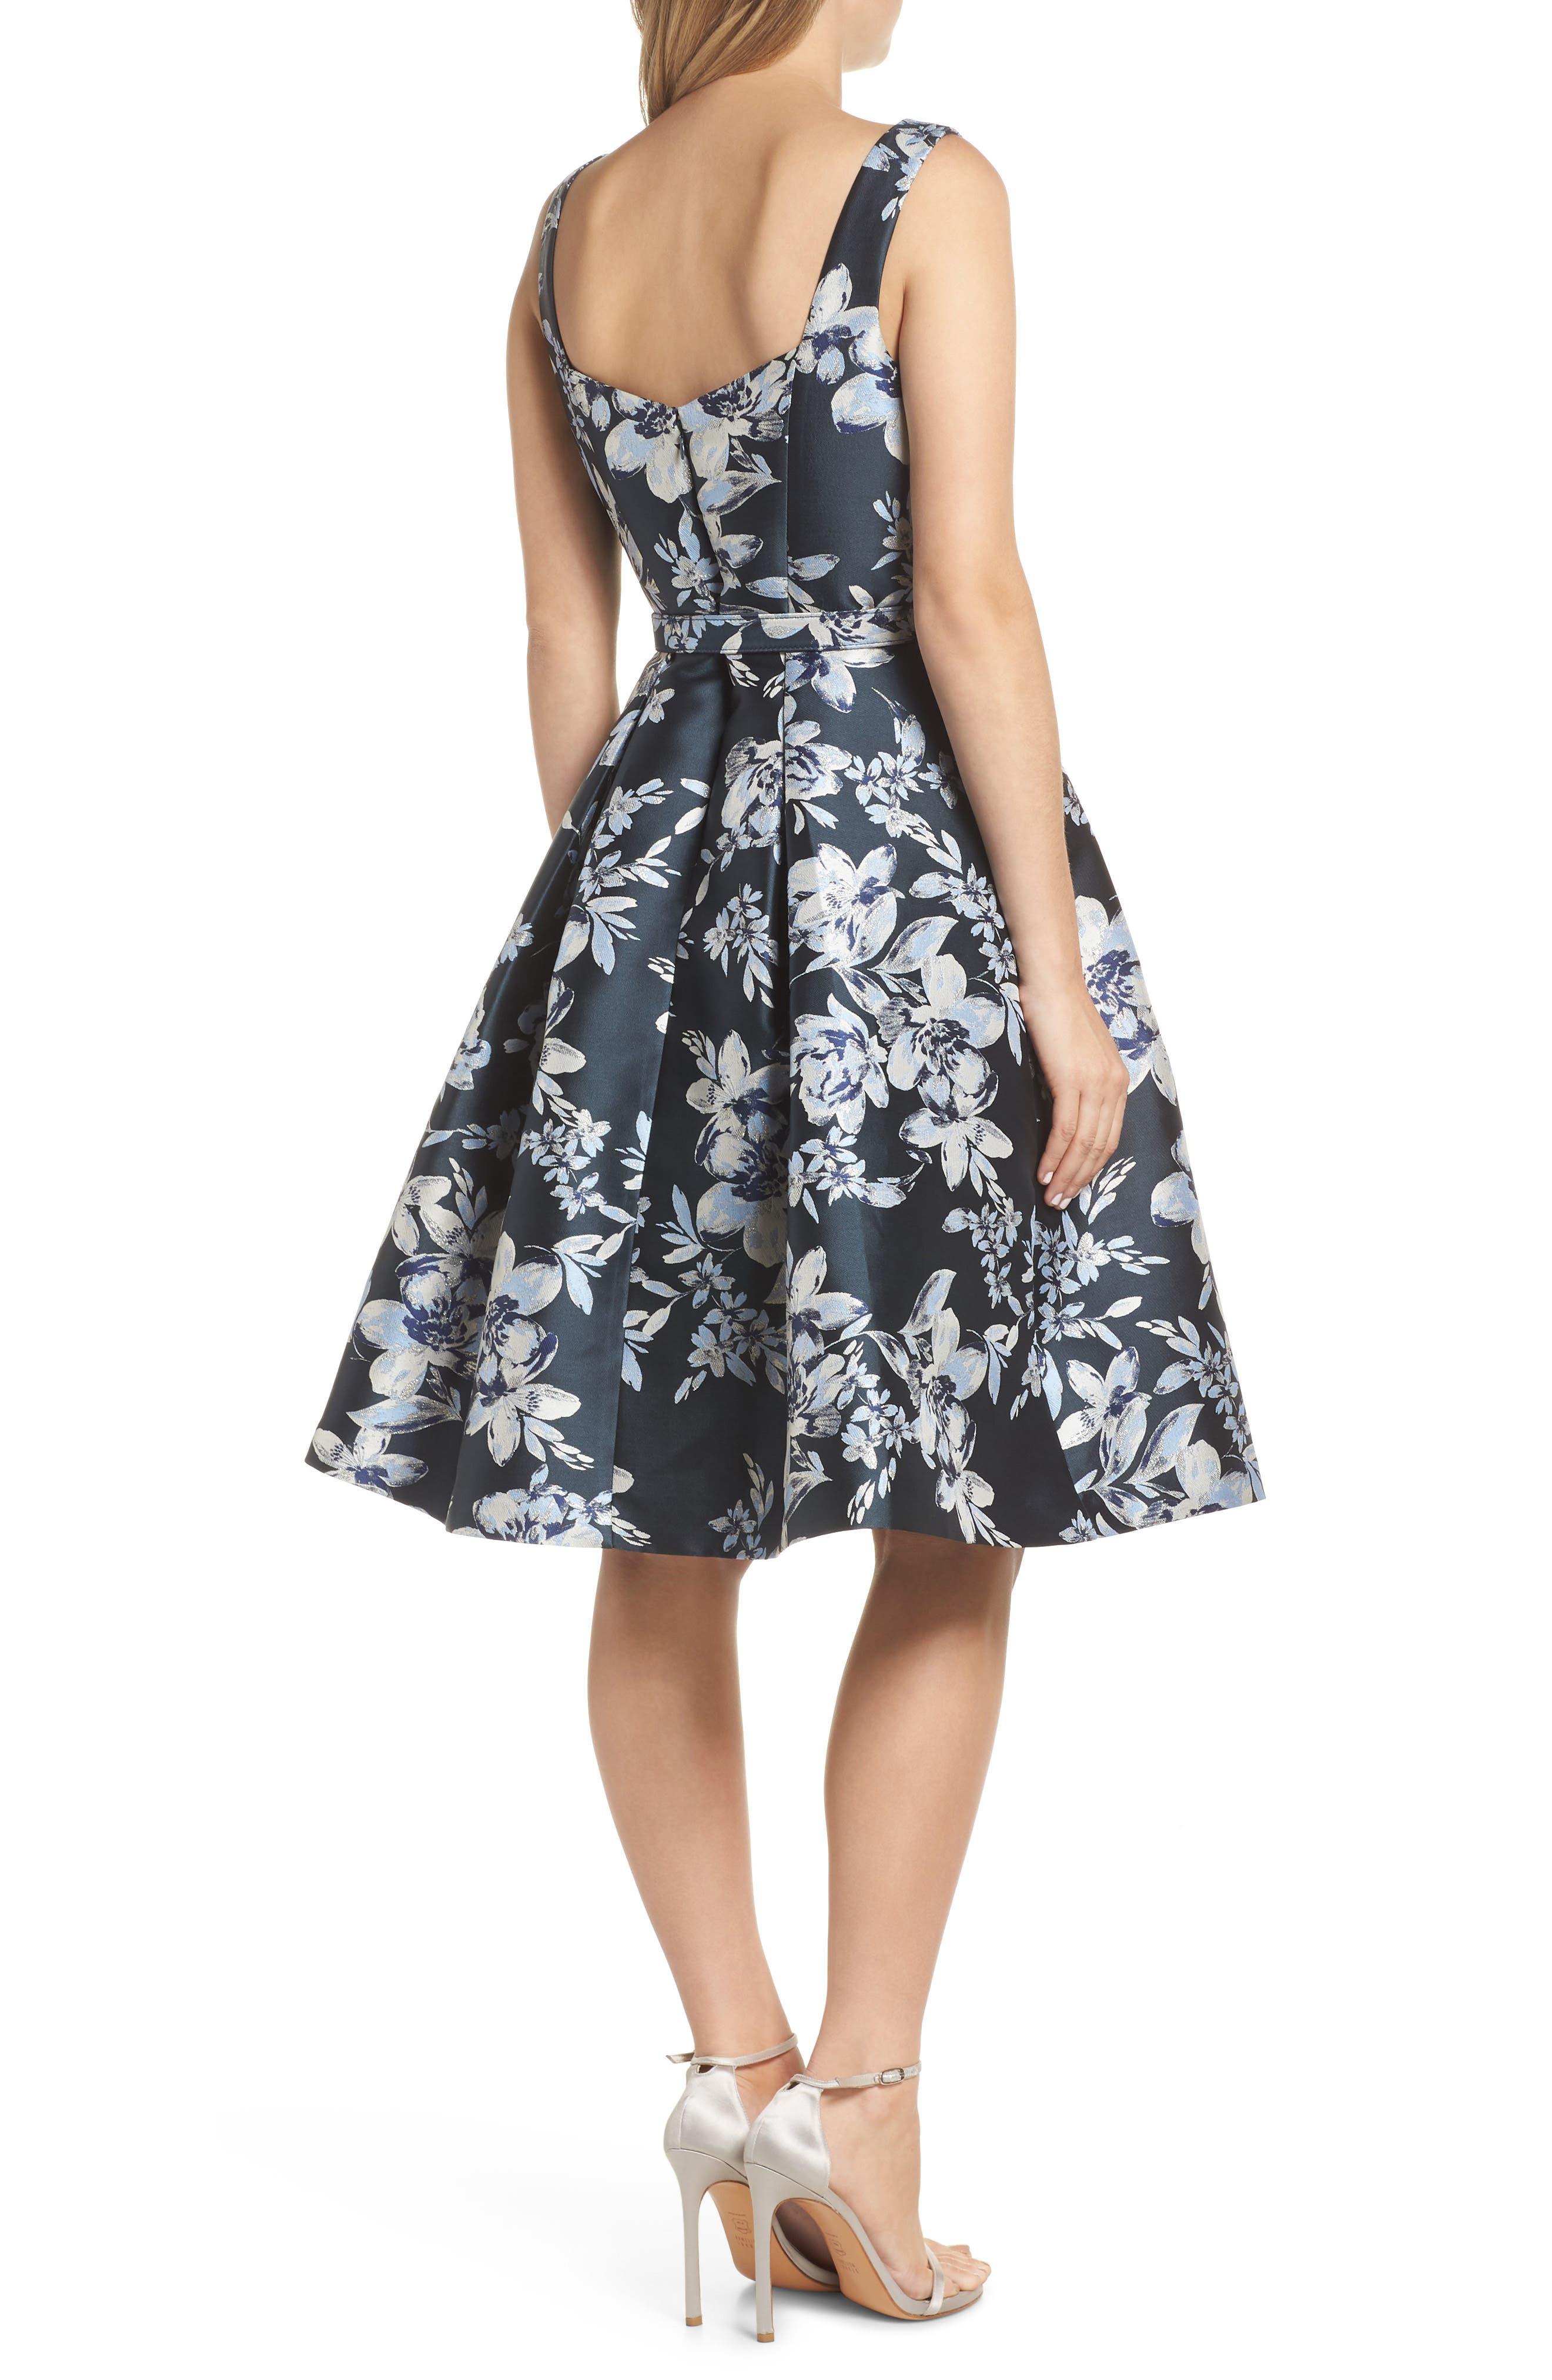 ELIZA J, Metallic Floral Belted Fit & Flare Dress, Alternate thumbnail 2, color, NAVY